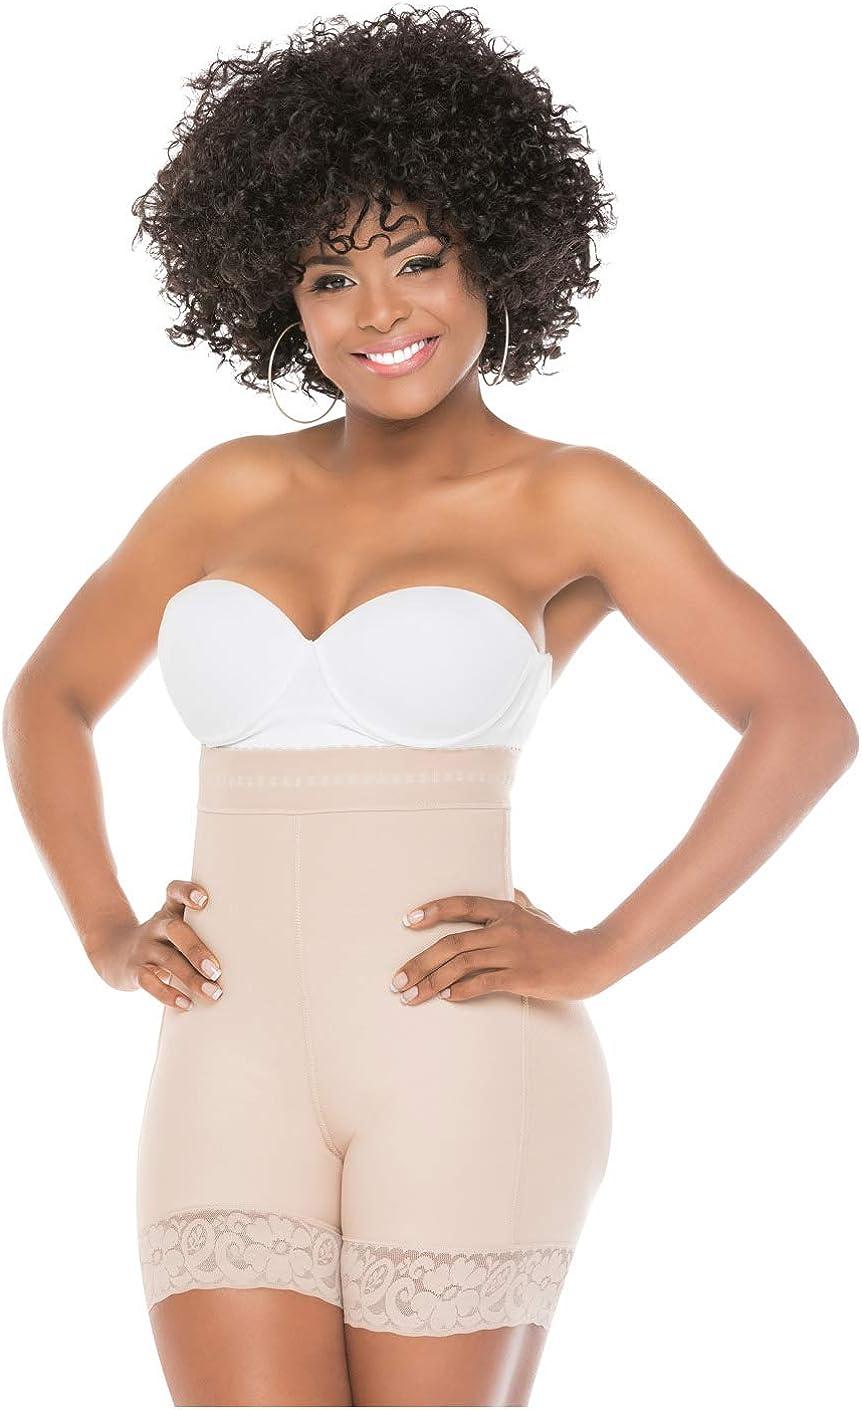 Salome 0218 High Waist Compression Shapewear Tummy Control BBL Shorts Fajas Colombianas para Mujer Levanta Cola at  Women's Clothing store